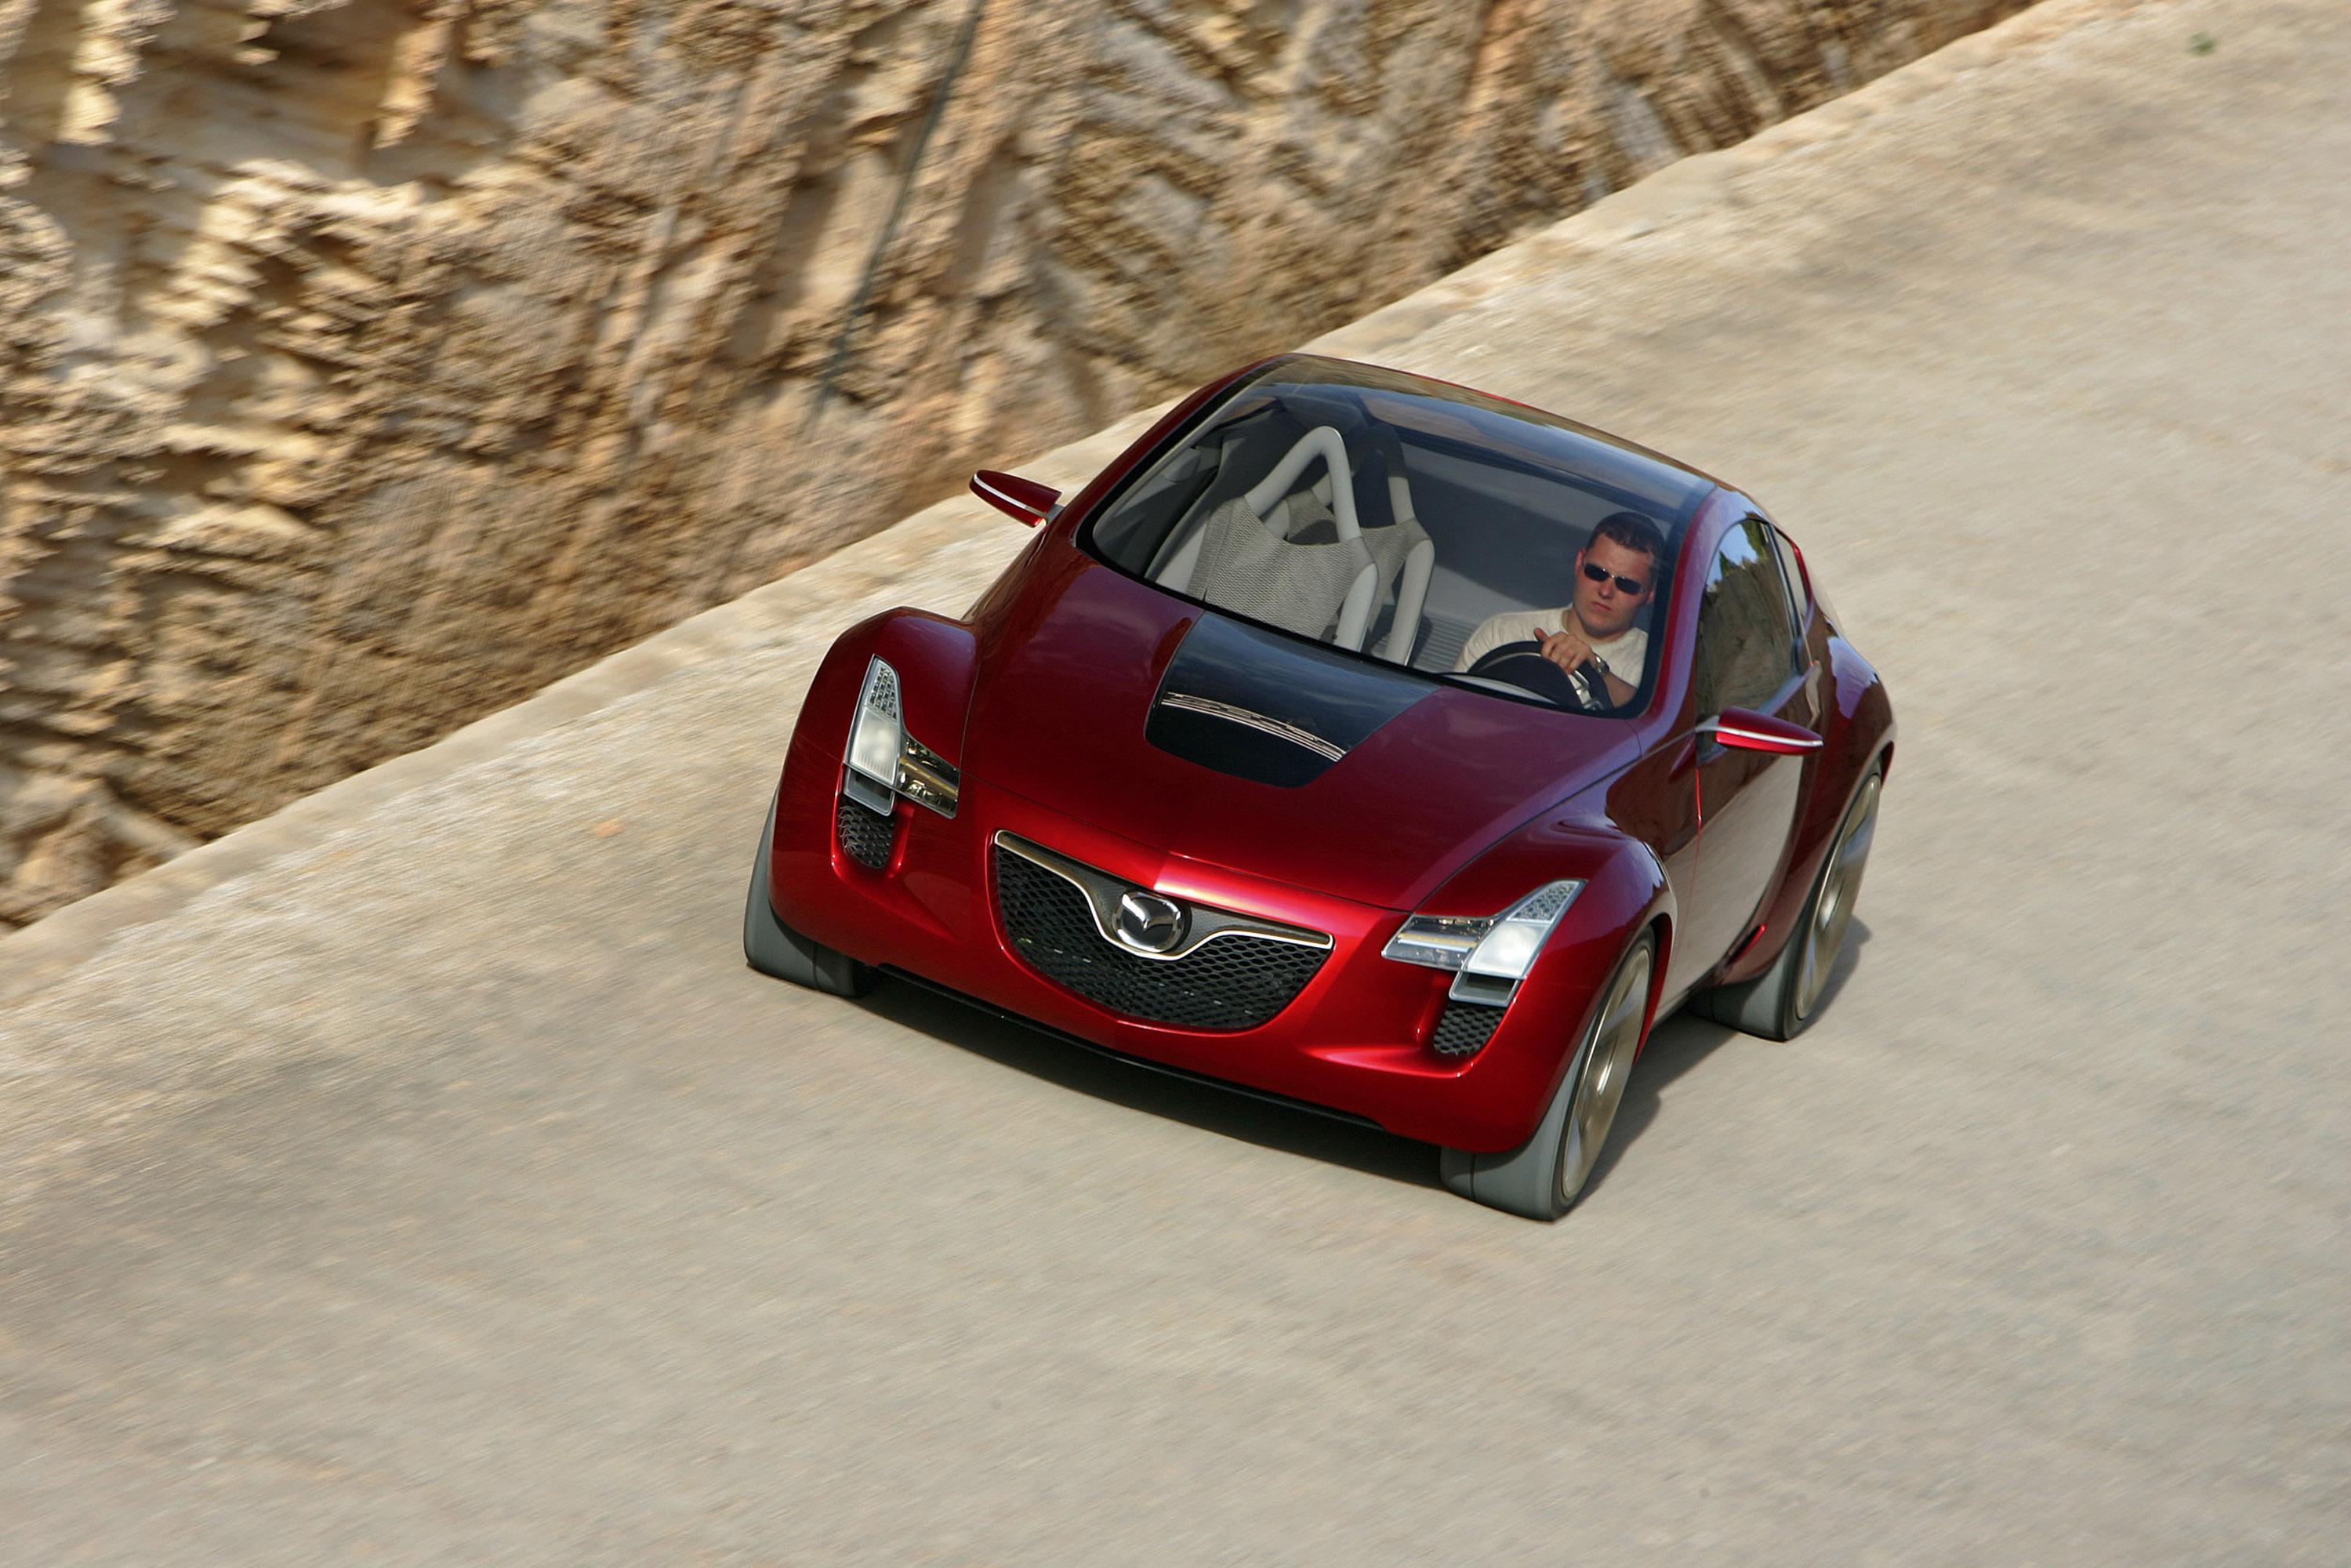 https://www.carsinvasion.com/gallery/2006-mazda-kabura-concept/2006-mazda-kabura-concept-12.jpg